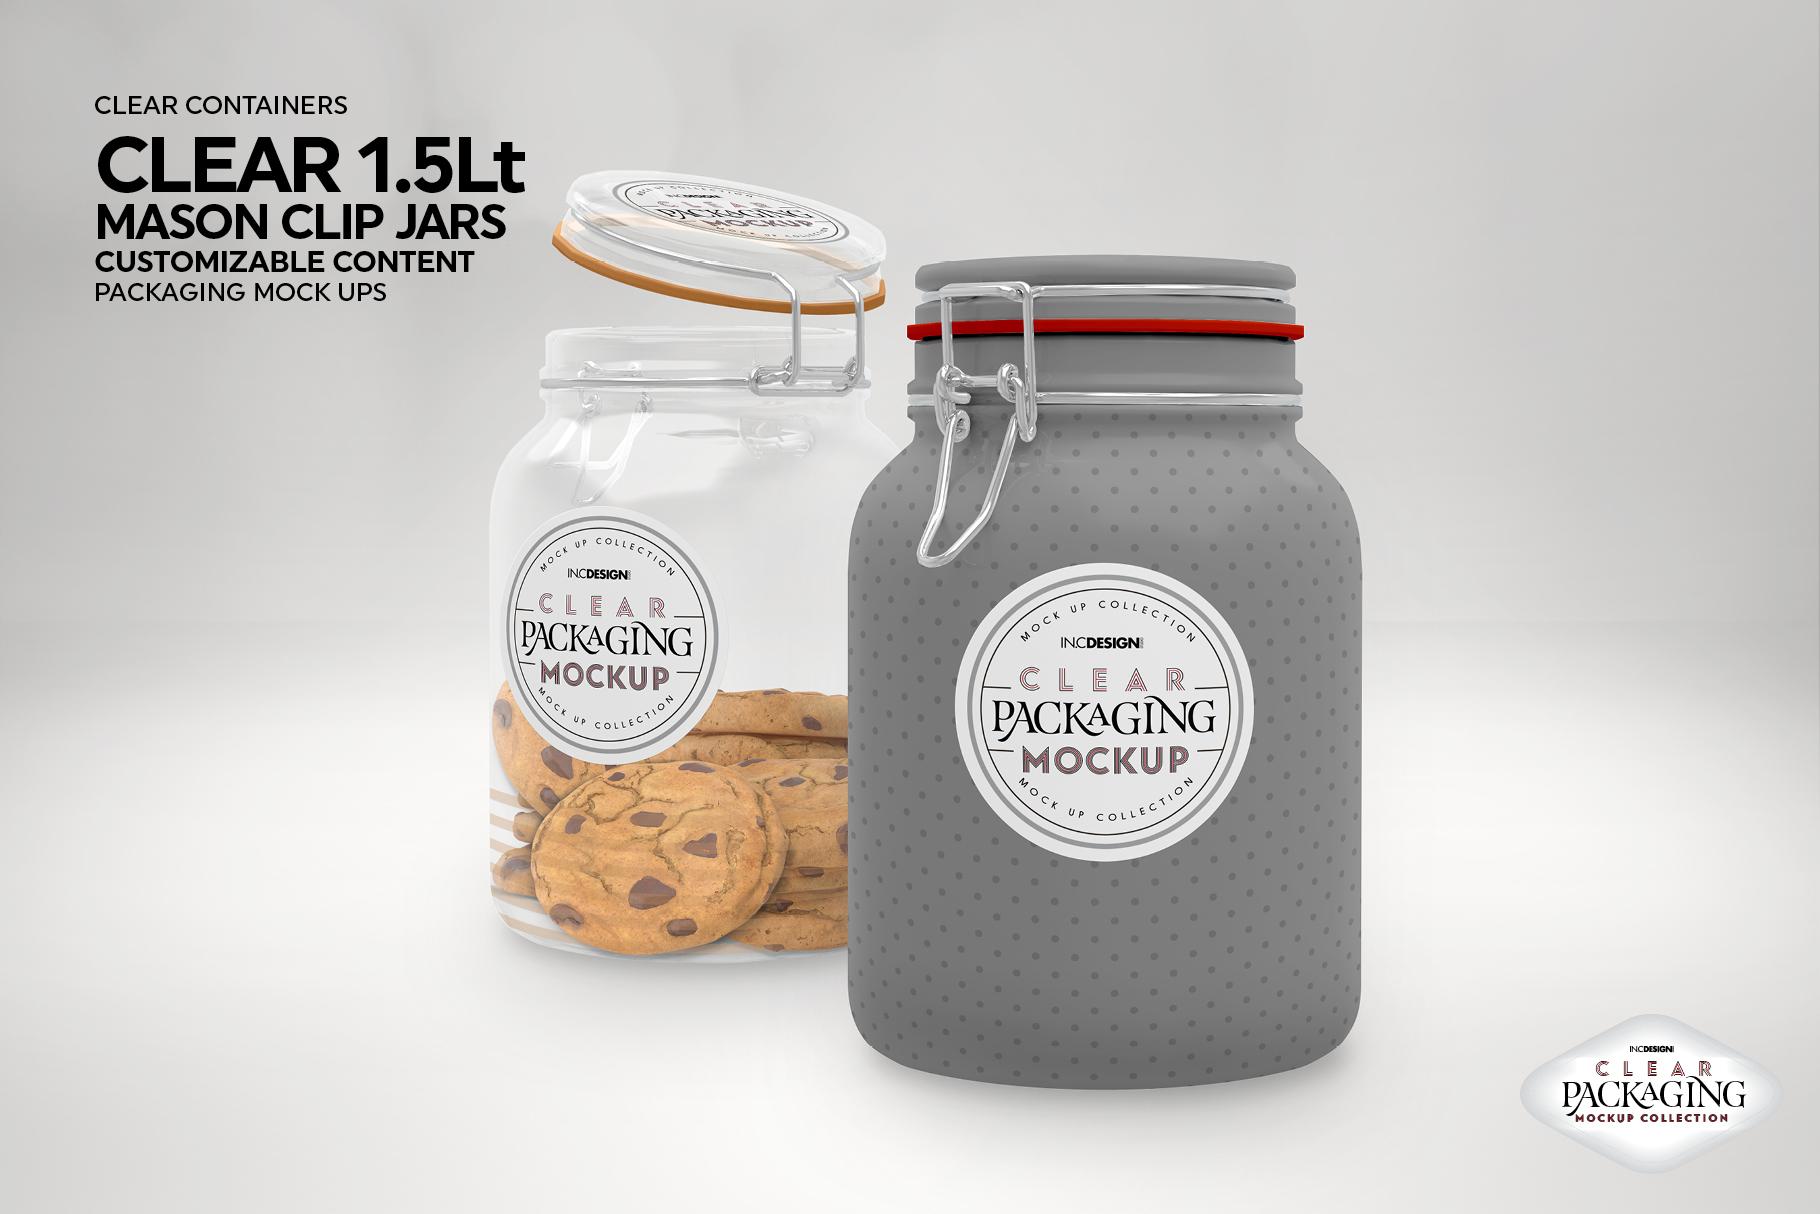 Clear 1.5 Liter Mason Clip Jar Packaging Mockup example image 5